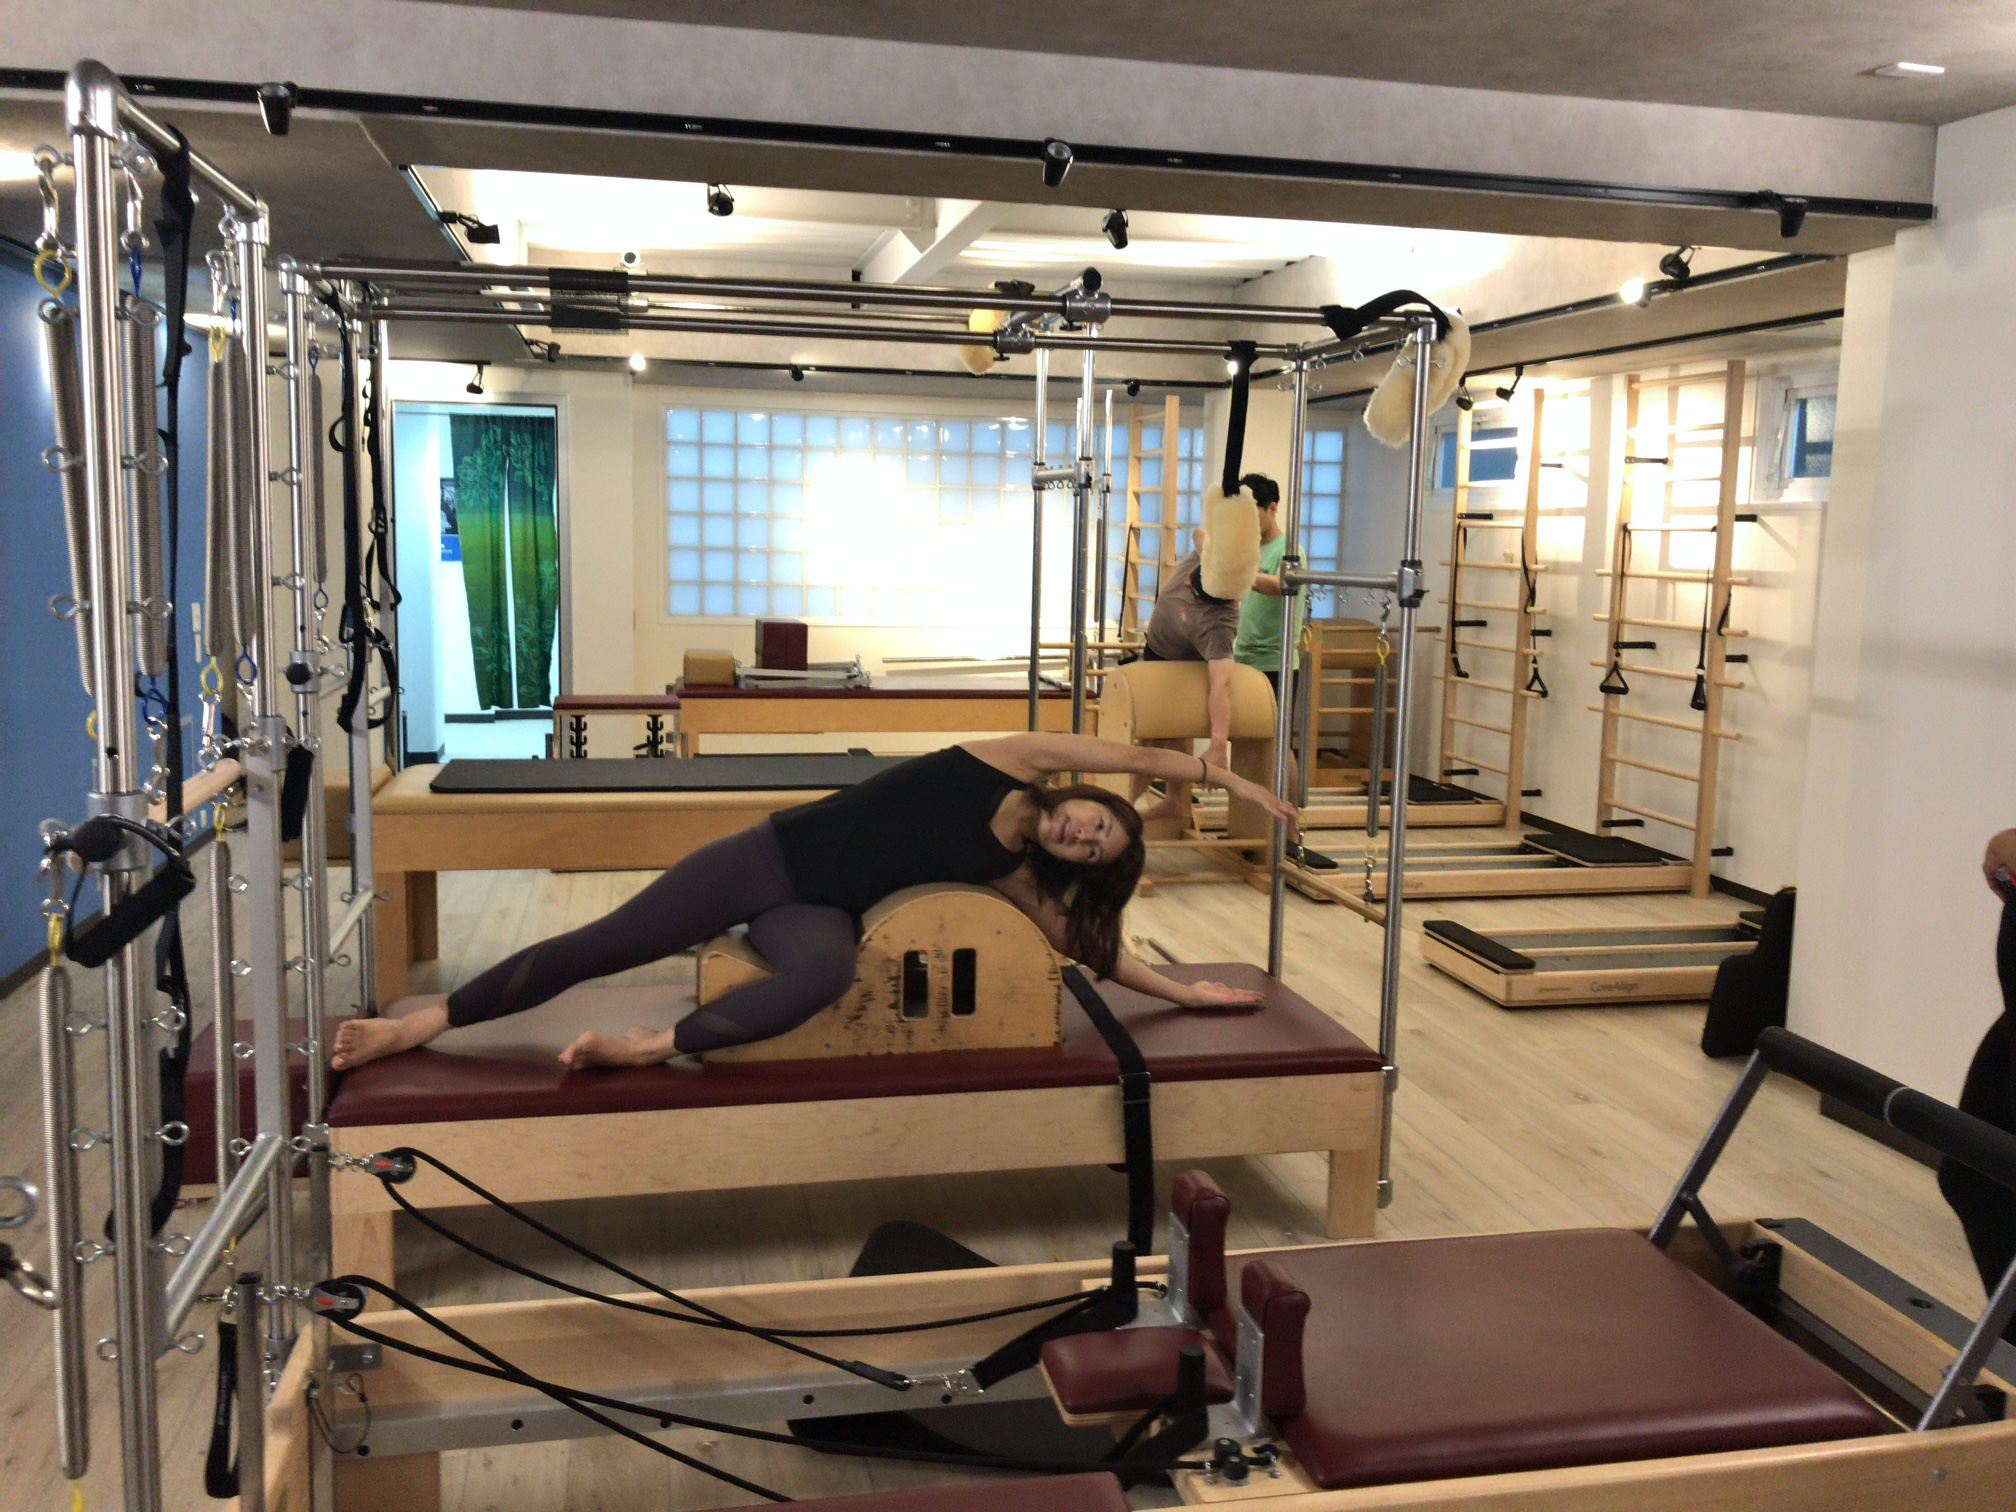 zen place pilates by basi Pilates下北沢リフォーマー専門スタジオの内観03